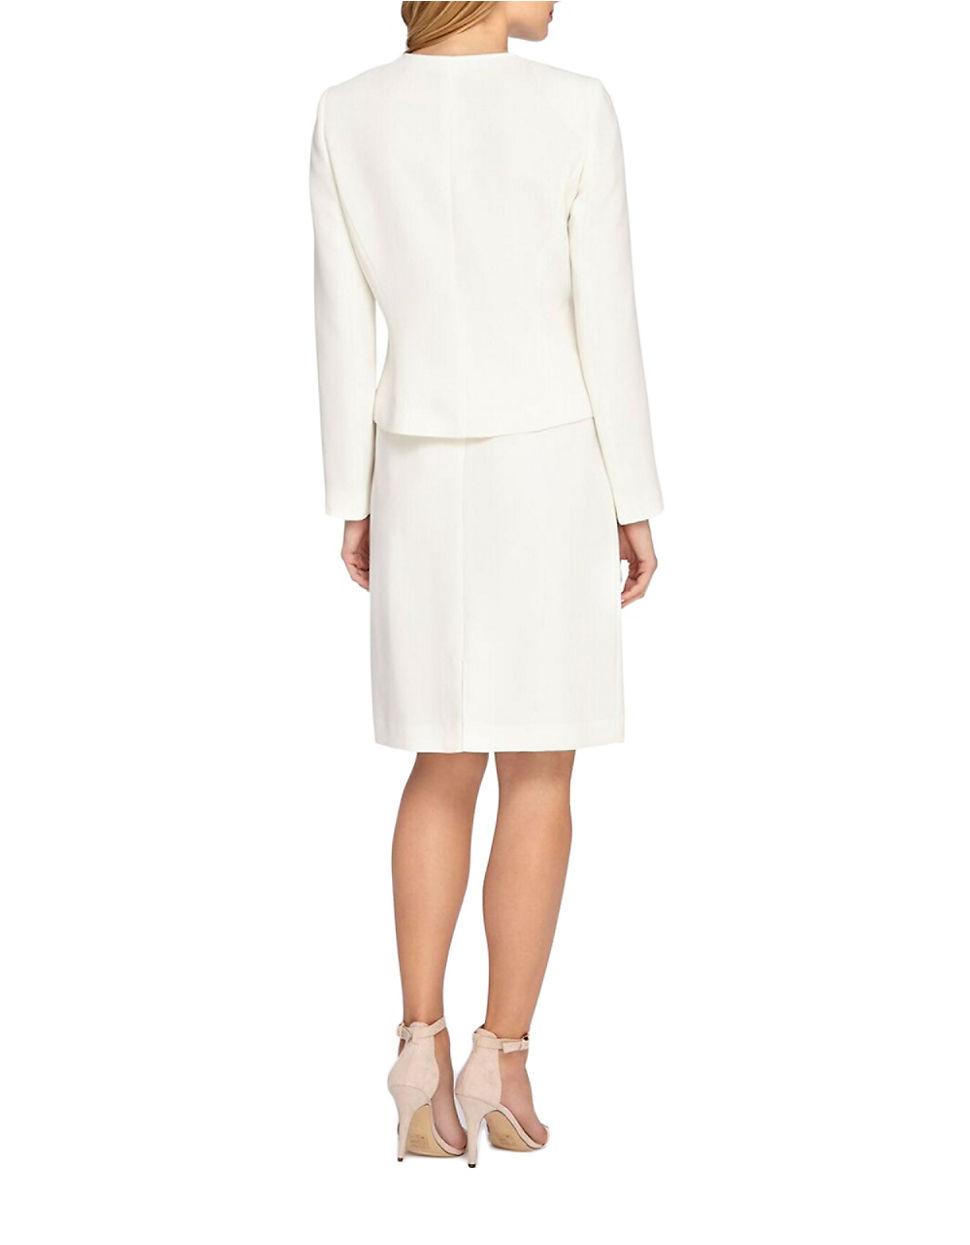 Tahari 2-piece Ruffled Jacket And Skirt Set - Lyst